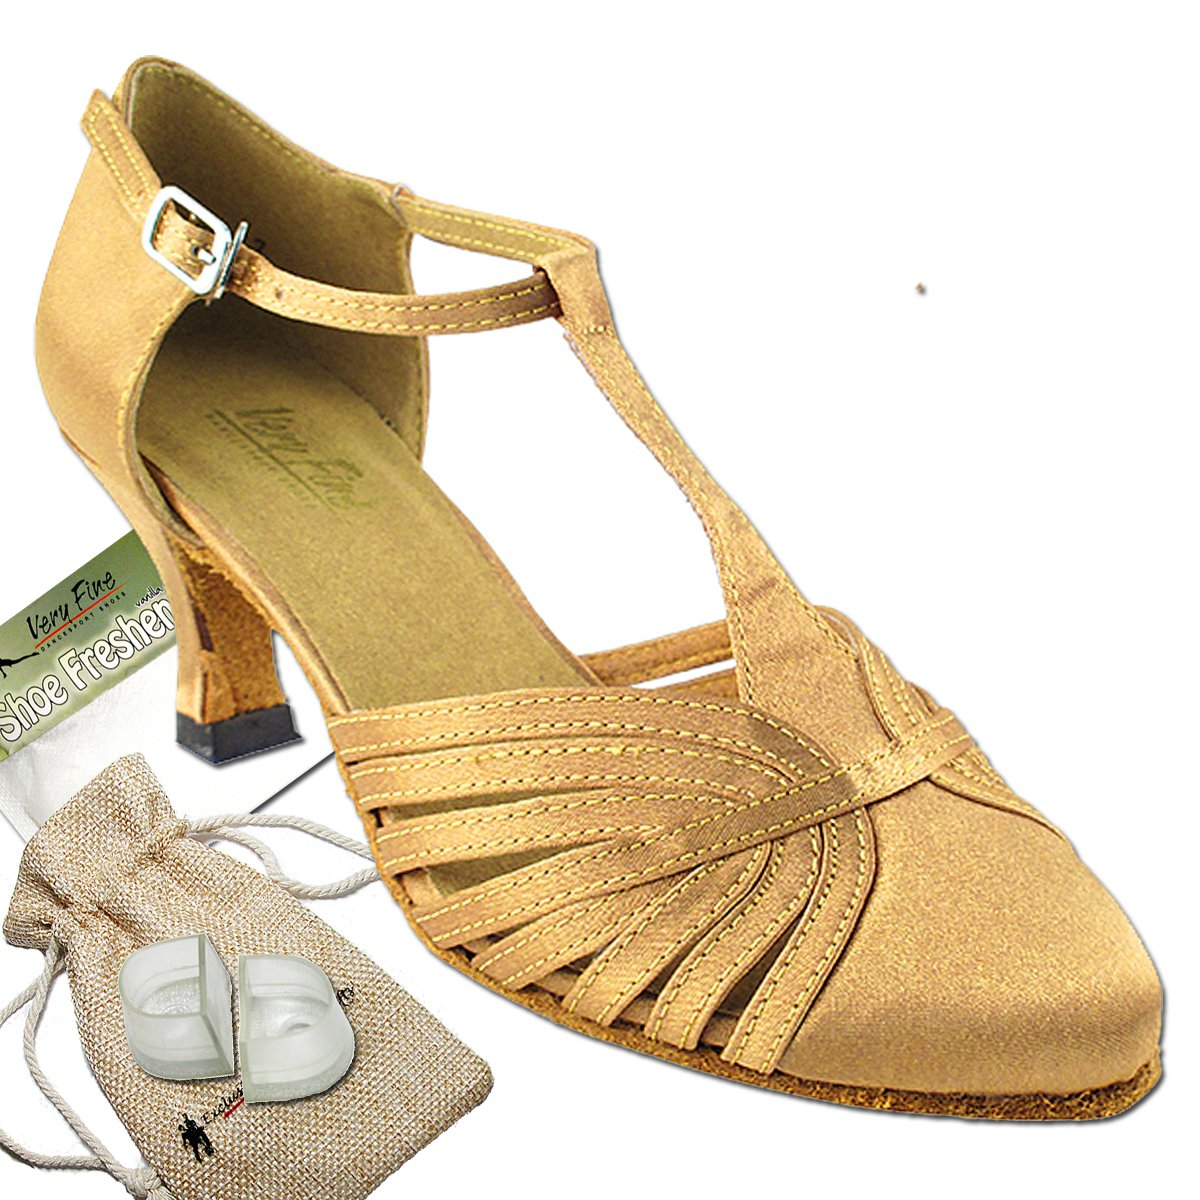 Women's Ballroom Dance Shoes Tango Wedding Salsa Dance Shoes Brown Satin 6829BEB Comfortable - Very Fine 2.5'' Heel 7.5 M US [Bundle of 5]